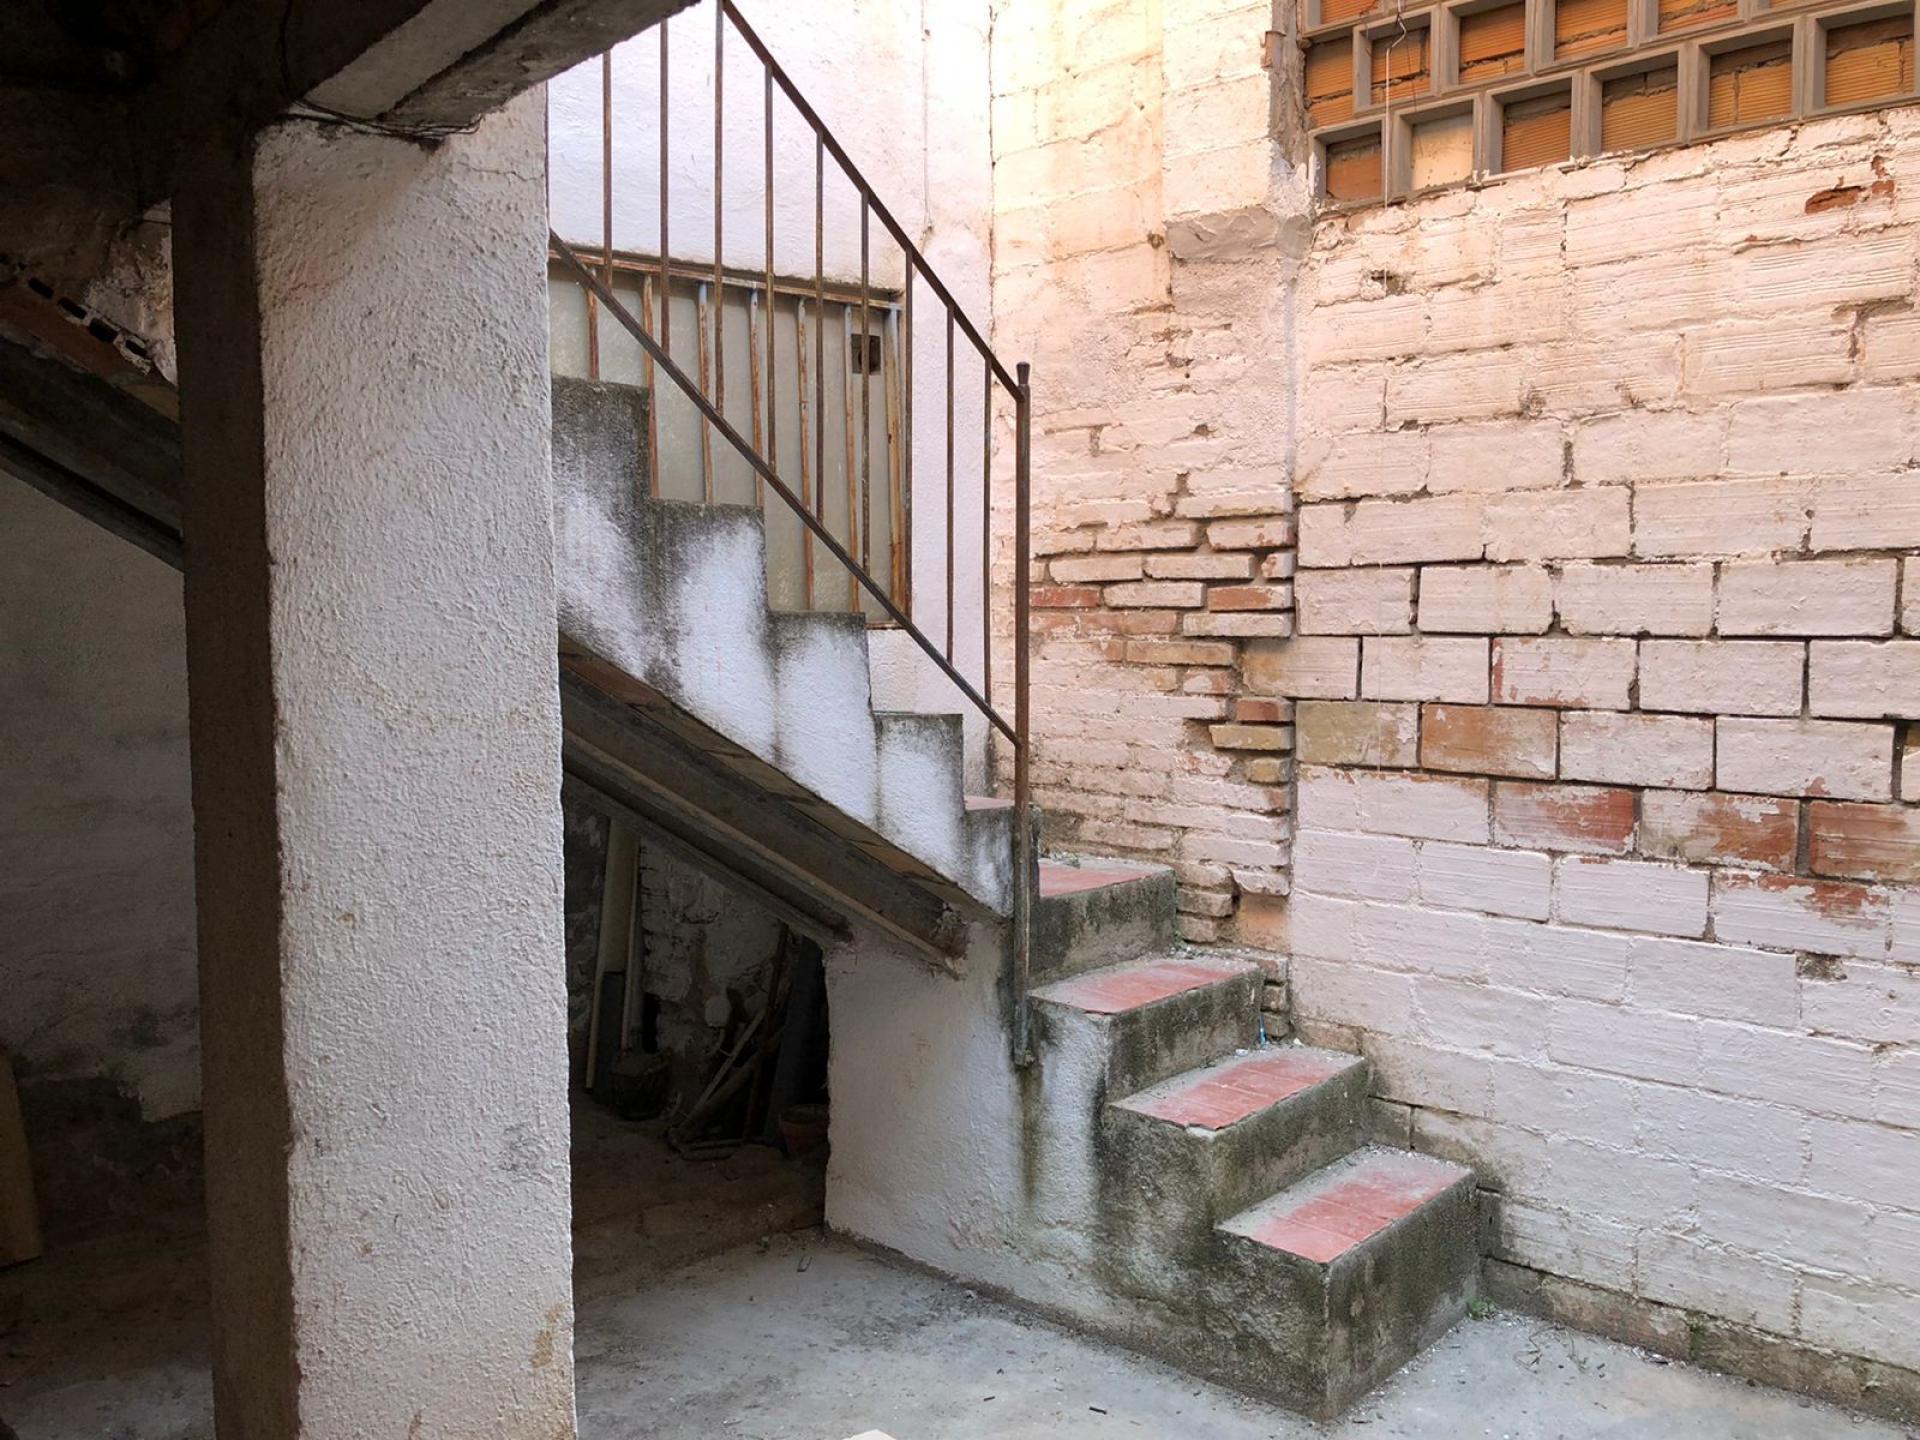 Foto 2 (V-727-2021) - Inmueble en  Venda a Sant Julià, Calle oriol , 15, Vilafranca del Penedès